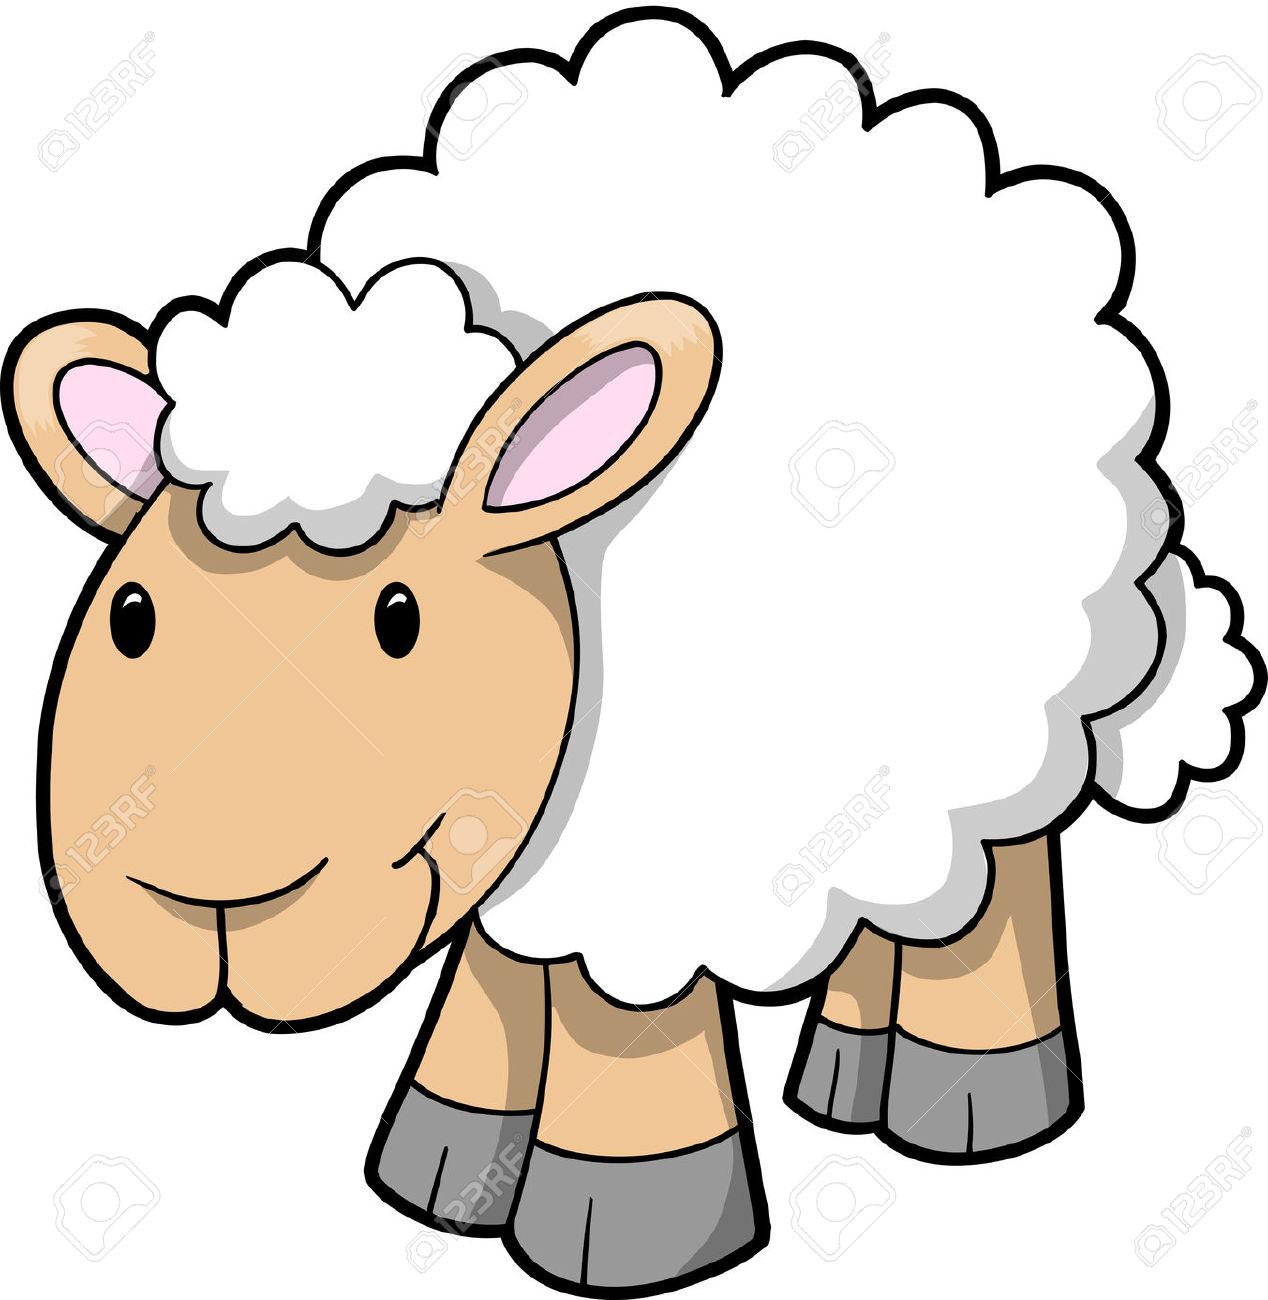 1268x1300 Of Happy Sheep Stock Vector Sheep Cartoon Lamb Id 64748 Clipart